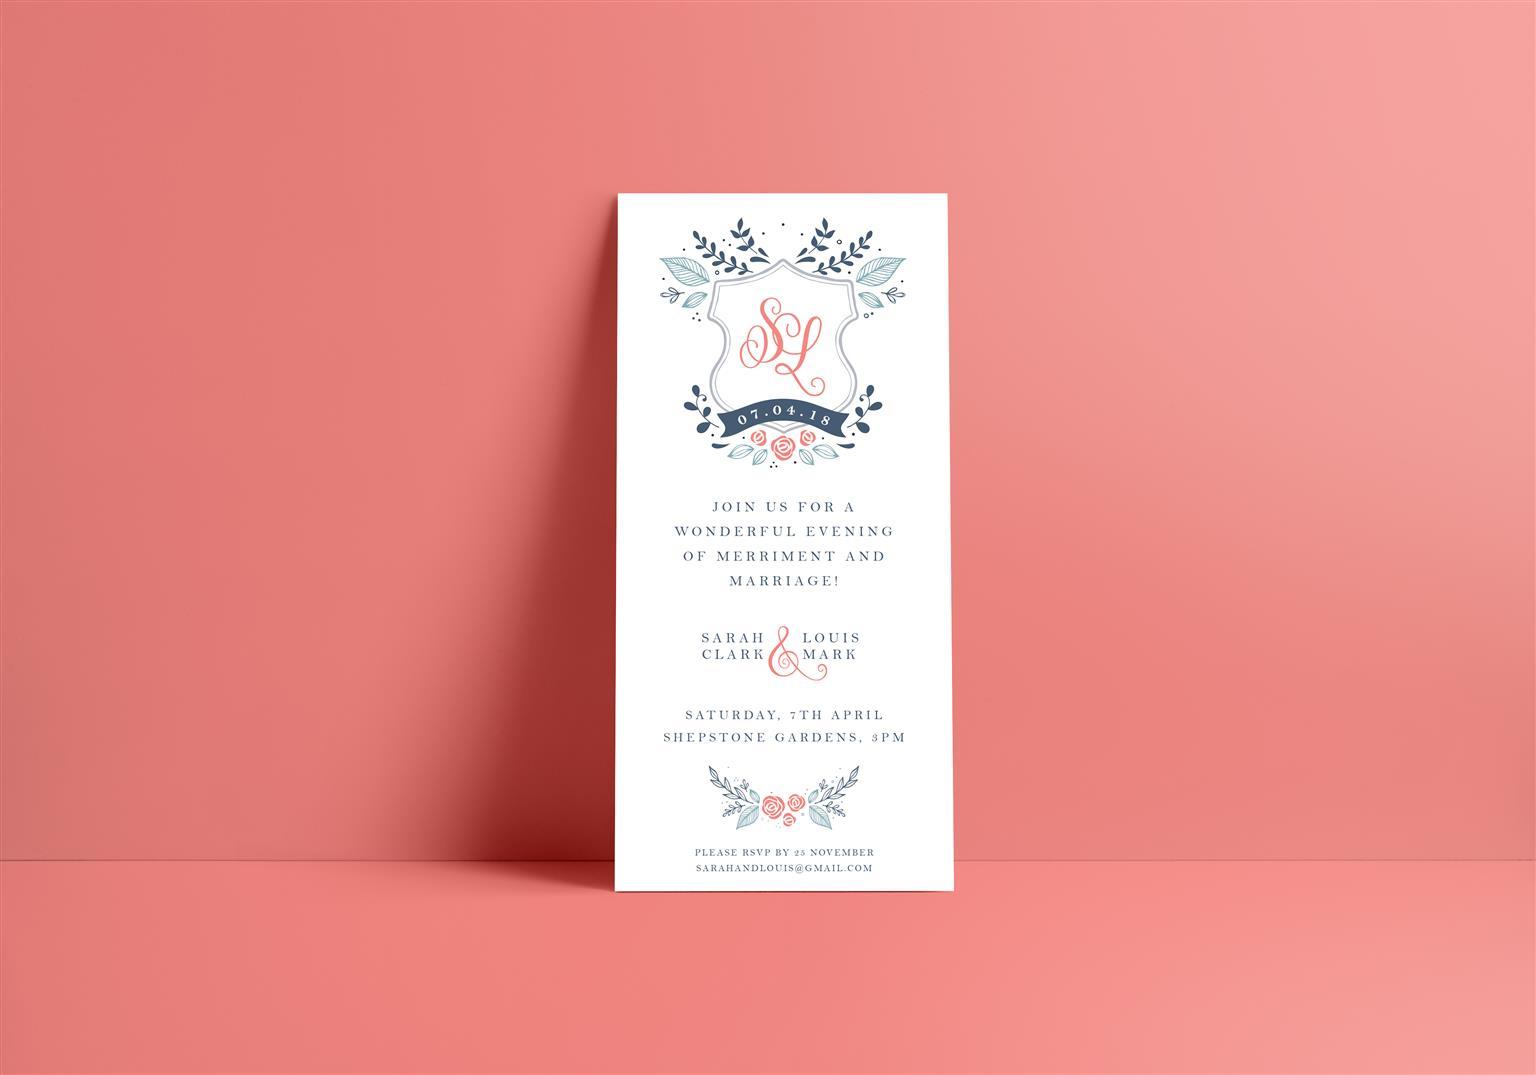 Wedding Invitation Design & Event Invitation Design | Junk Mail